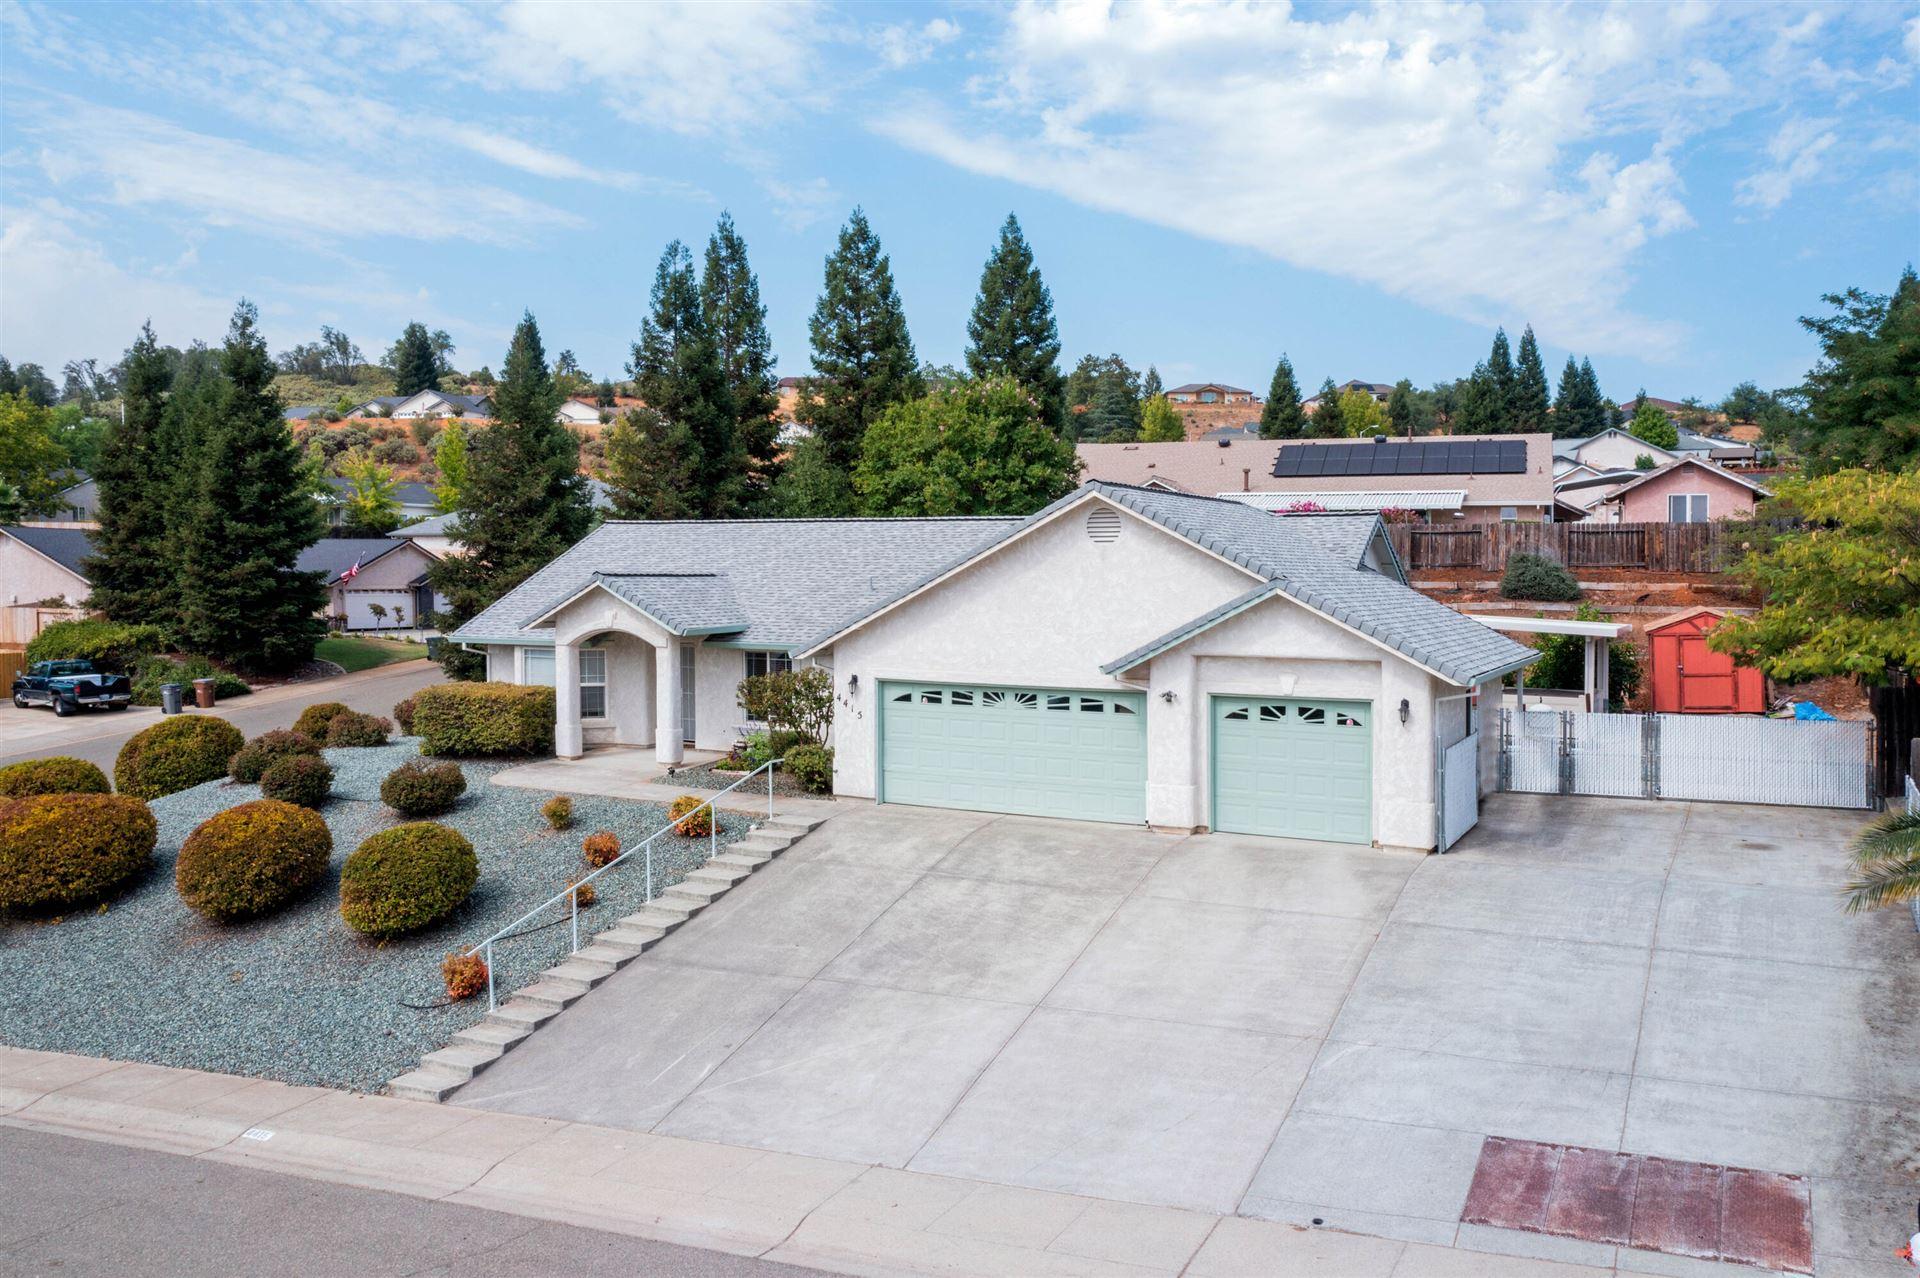 Photo of 4415 Trinity St, Shasta Lake, CA 96019 (MLS # 21-4326)